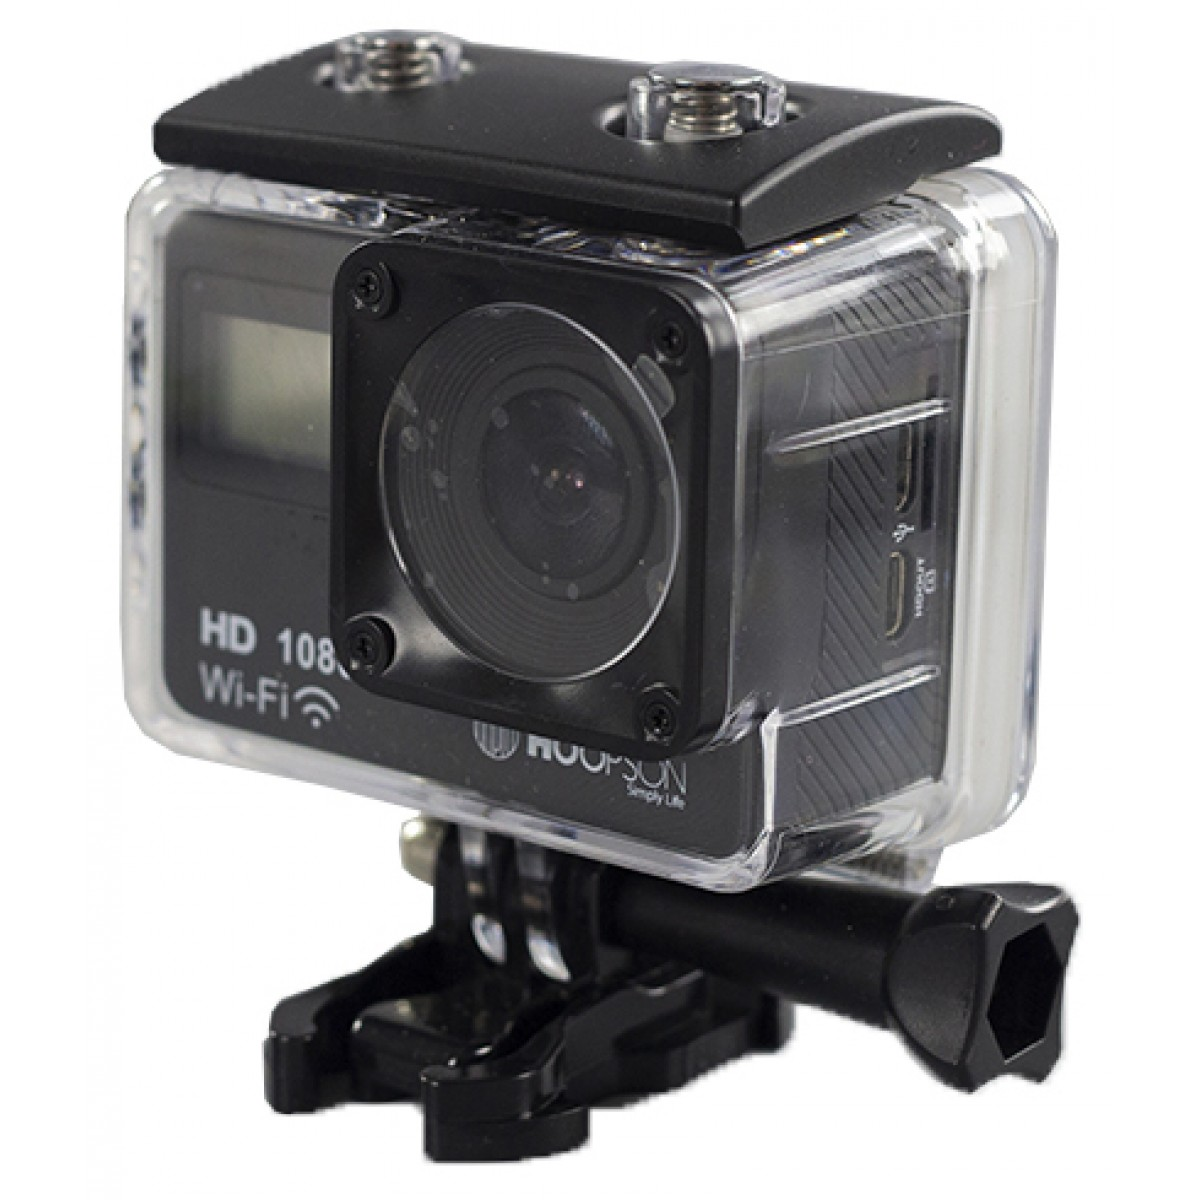 Câmera Filmadora Esportiva Webcam Hoopson FullHD, Wi-Fi, SCH-003 - Open Box